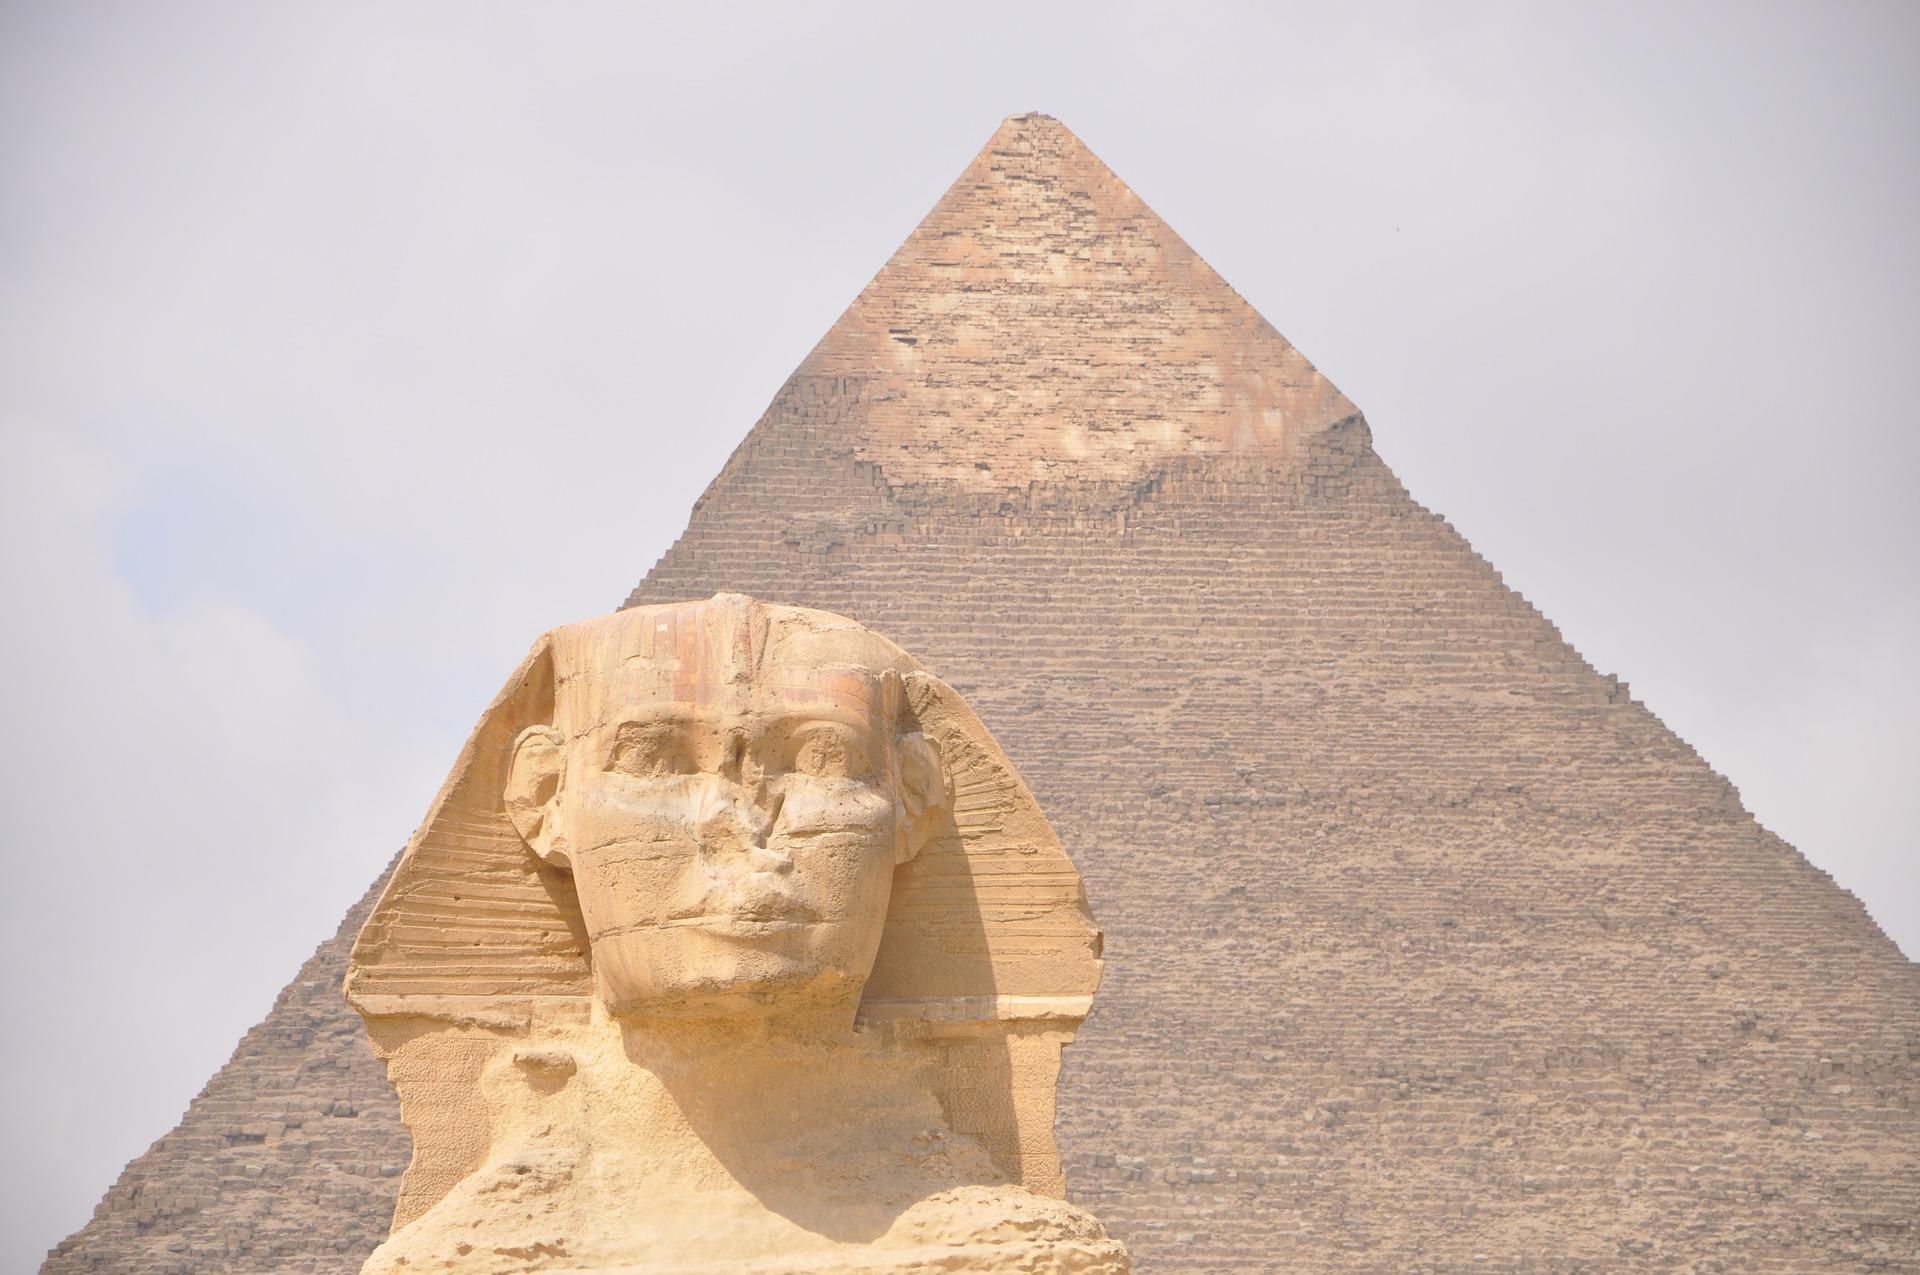 Lo que debes saber para visitar EgiptoLo que debes saber para visitar Egipto